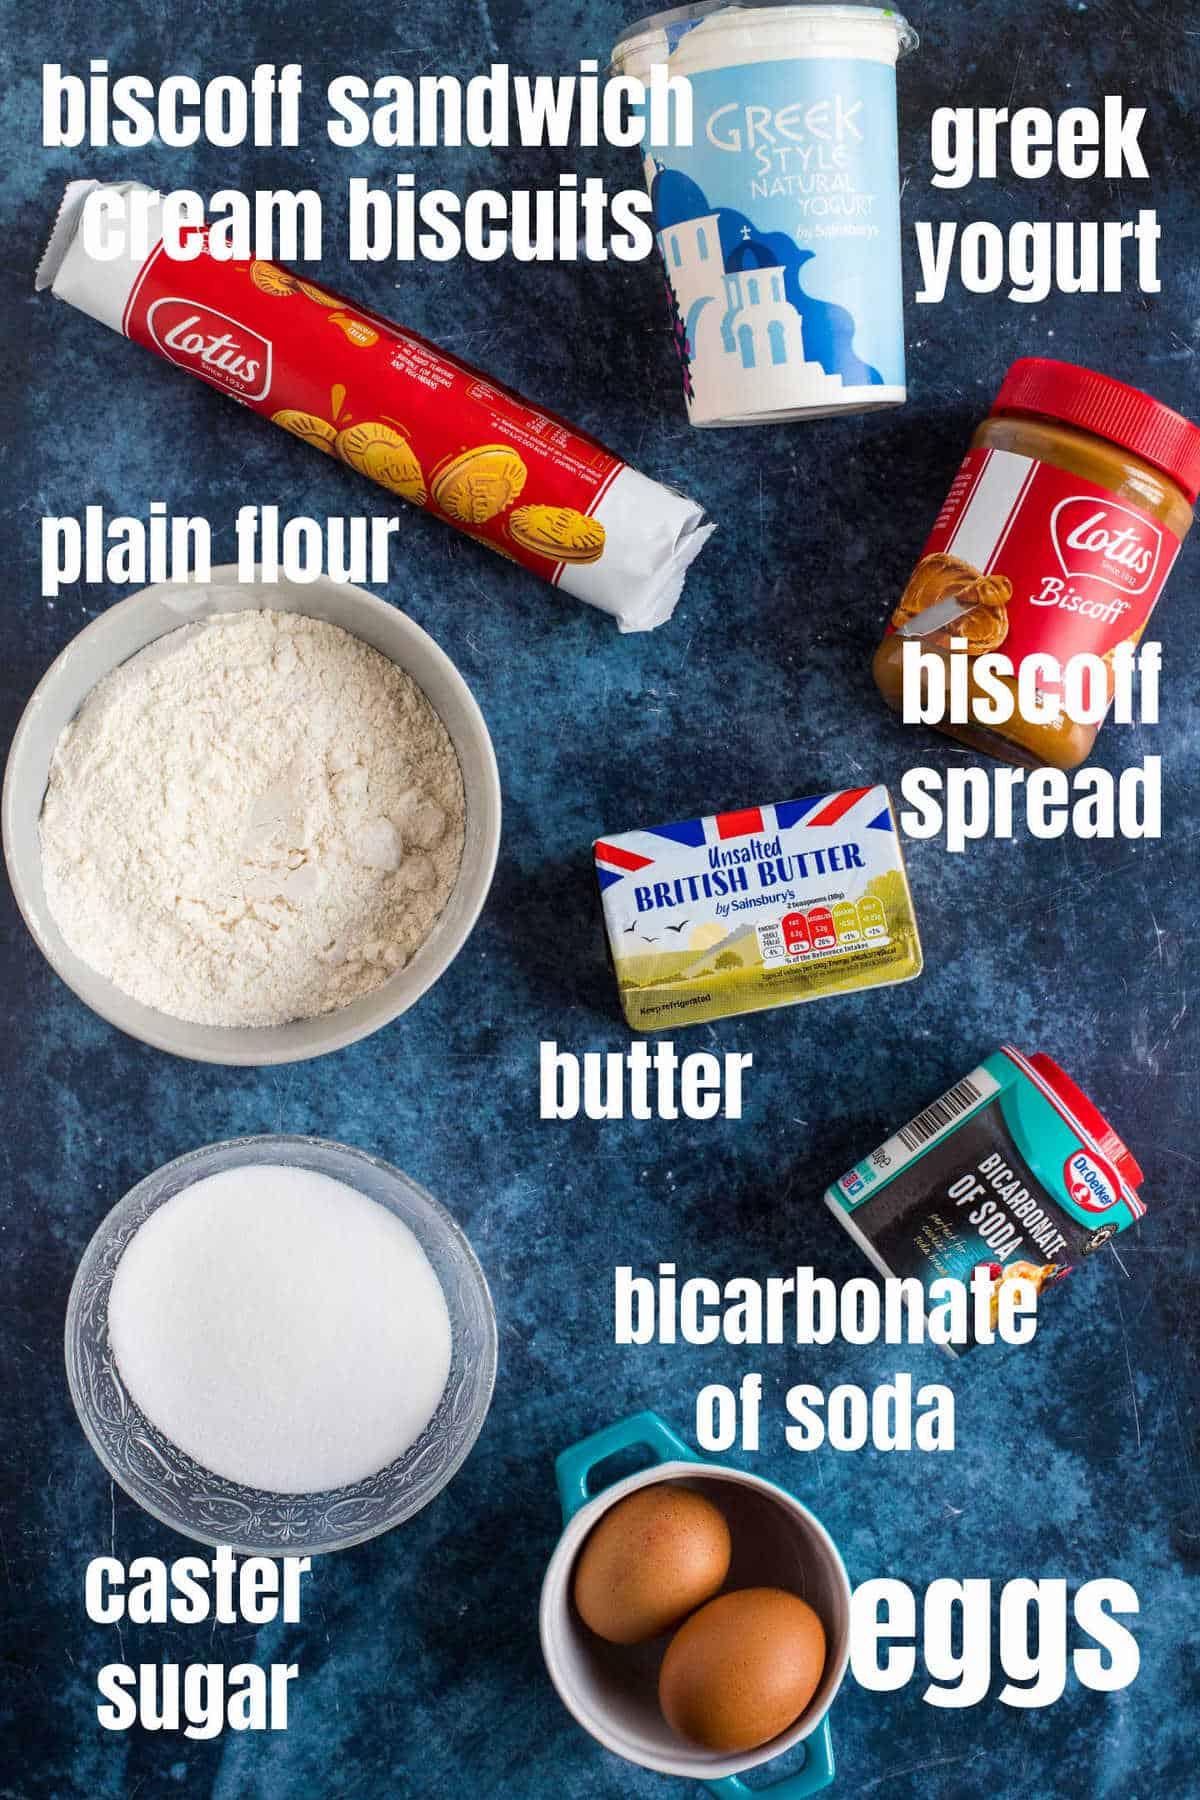 Ingredients for biscoff muffins.